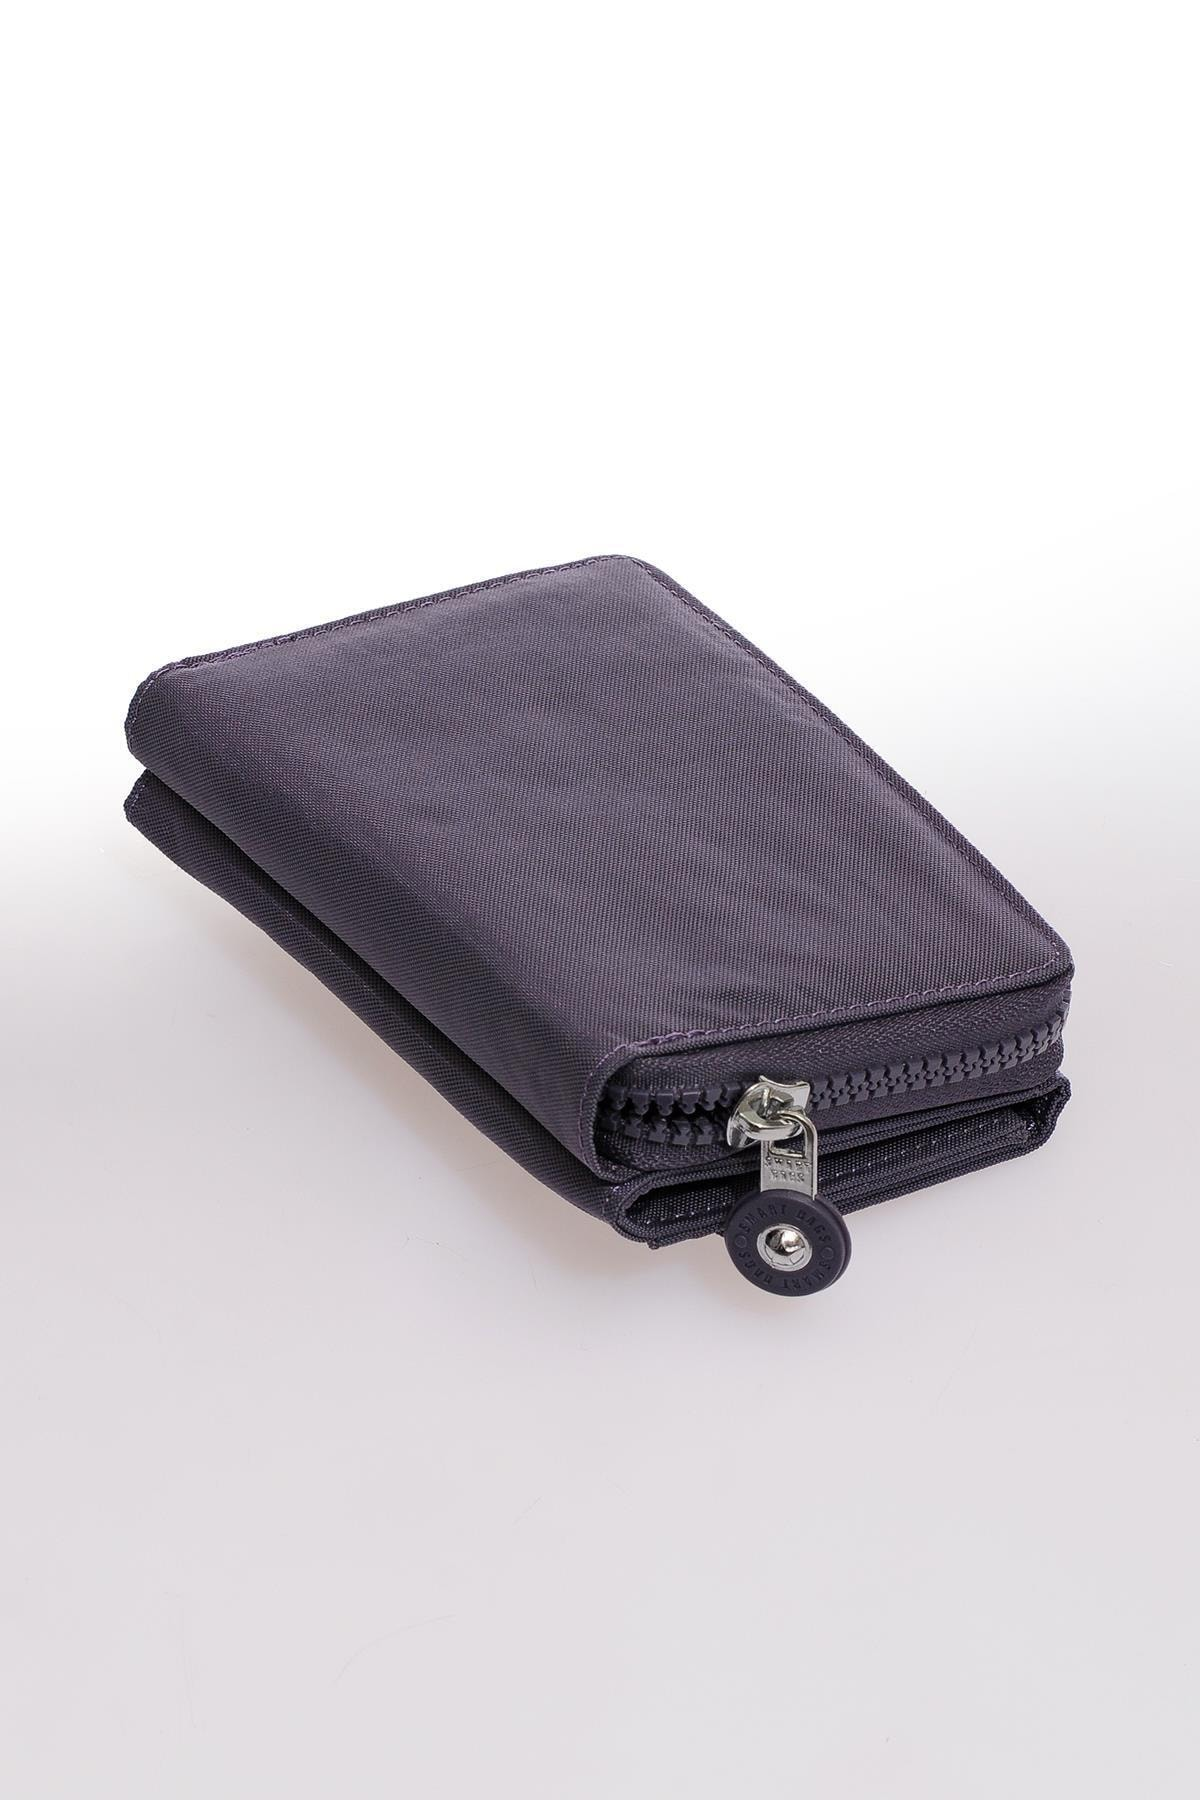 Smart Bags Smb3036-0027 Mor Kadın Cüzdan